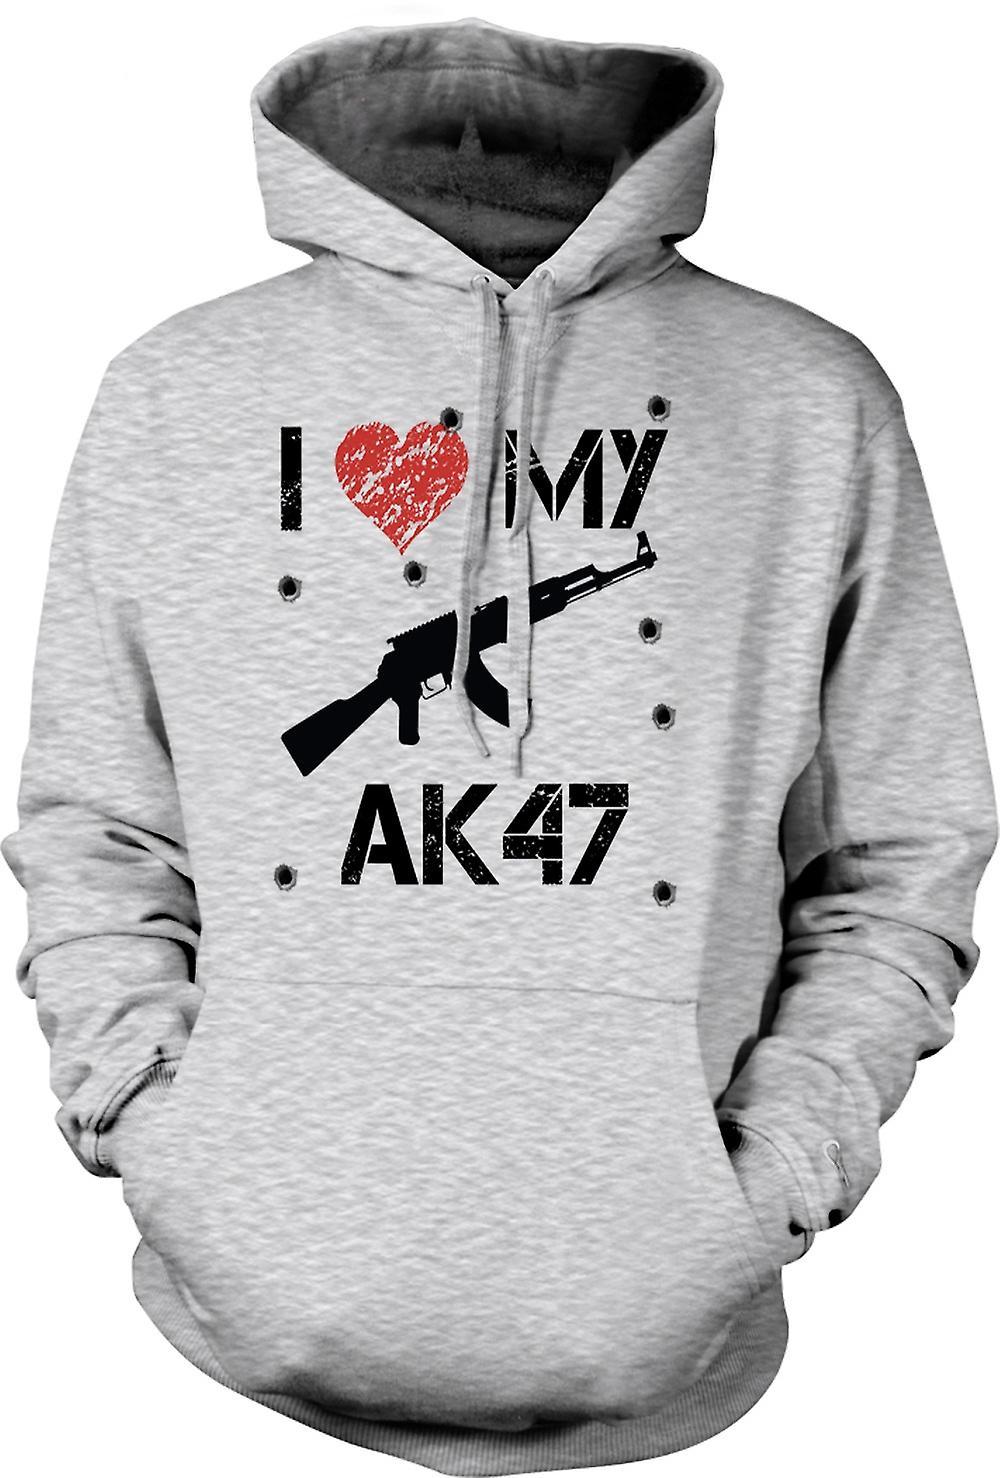 Mens Hoodie - j'aime mon AK47 - drôle